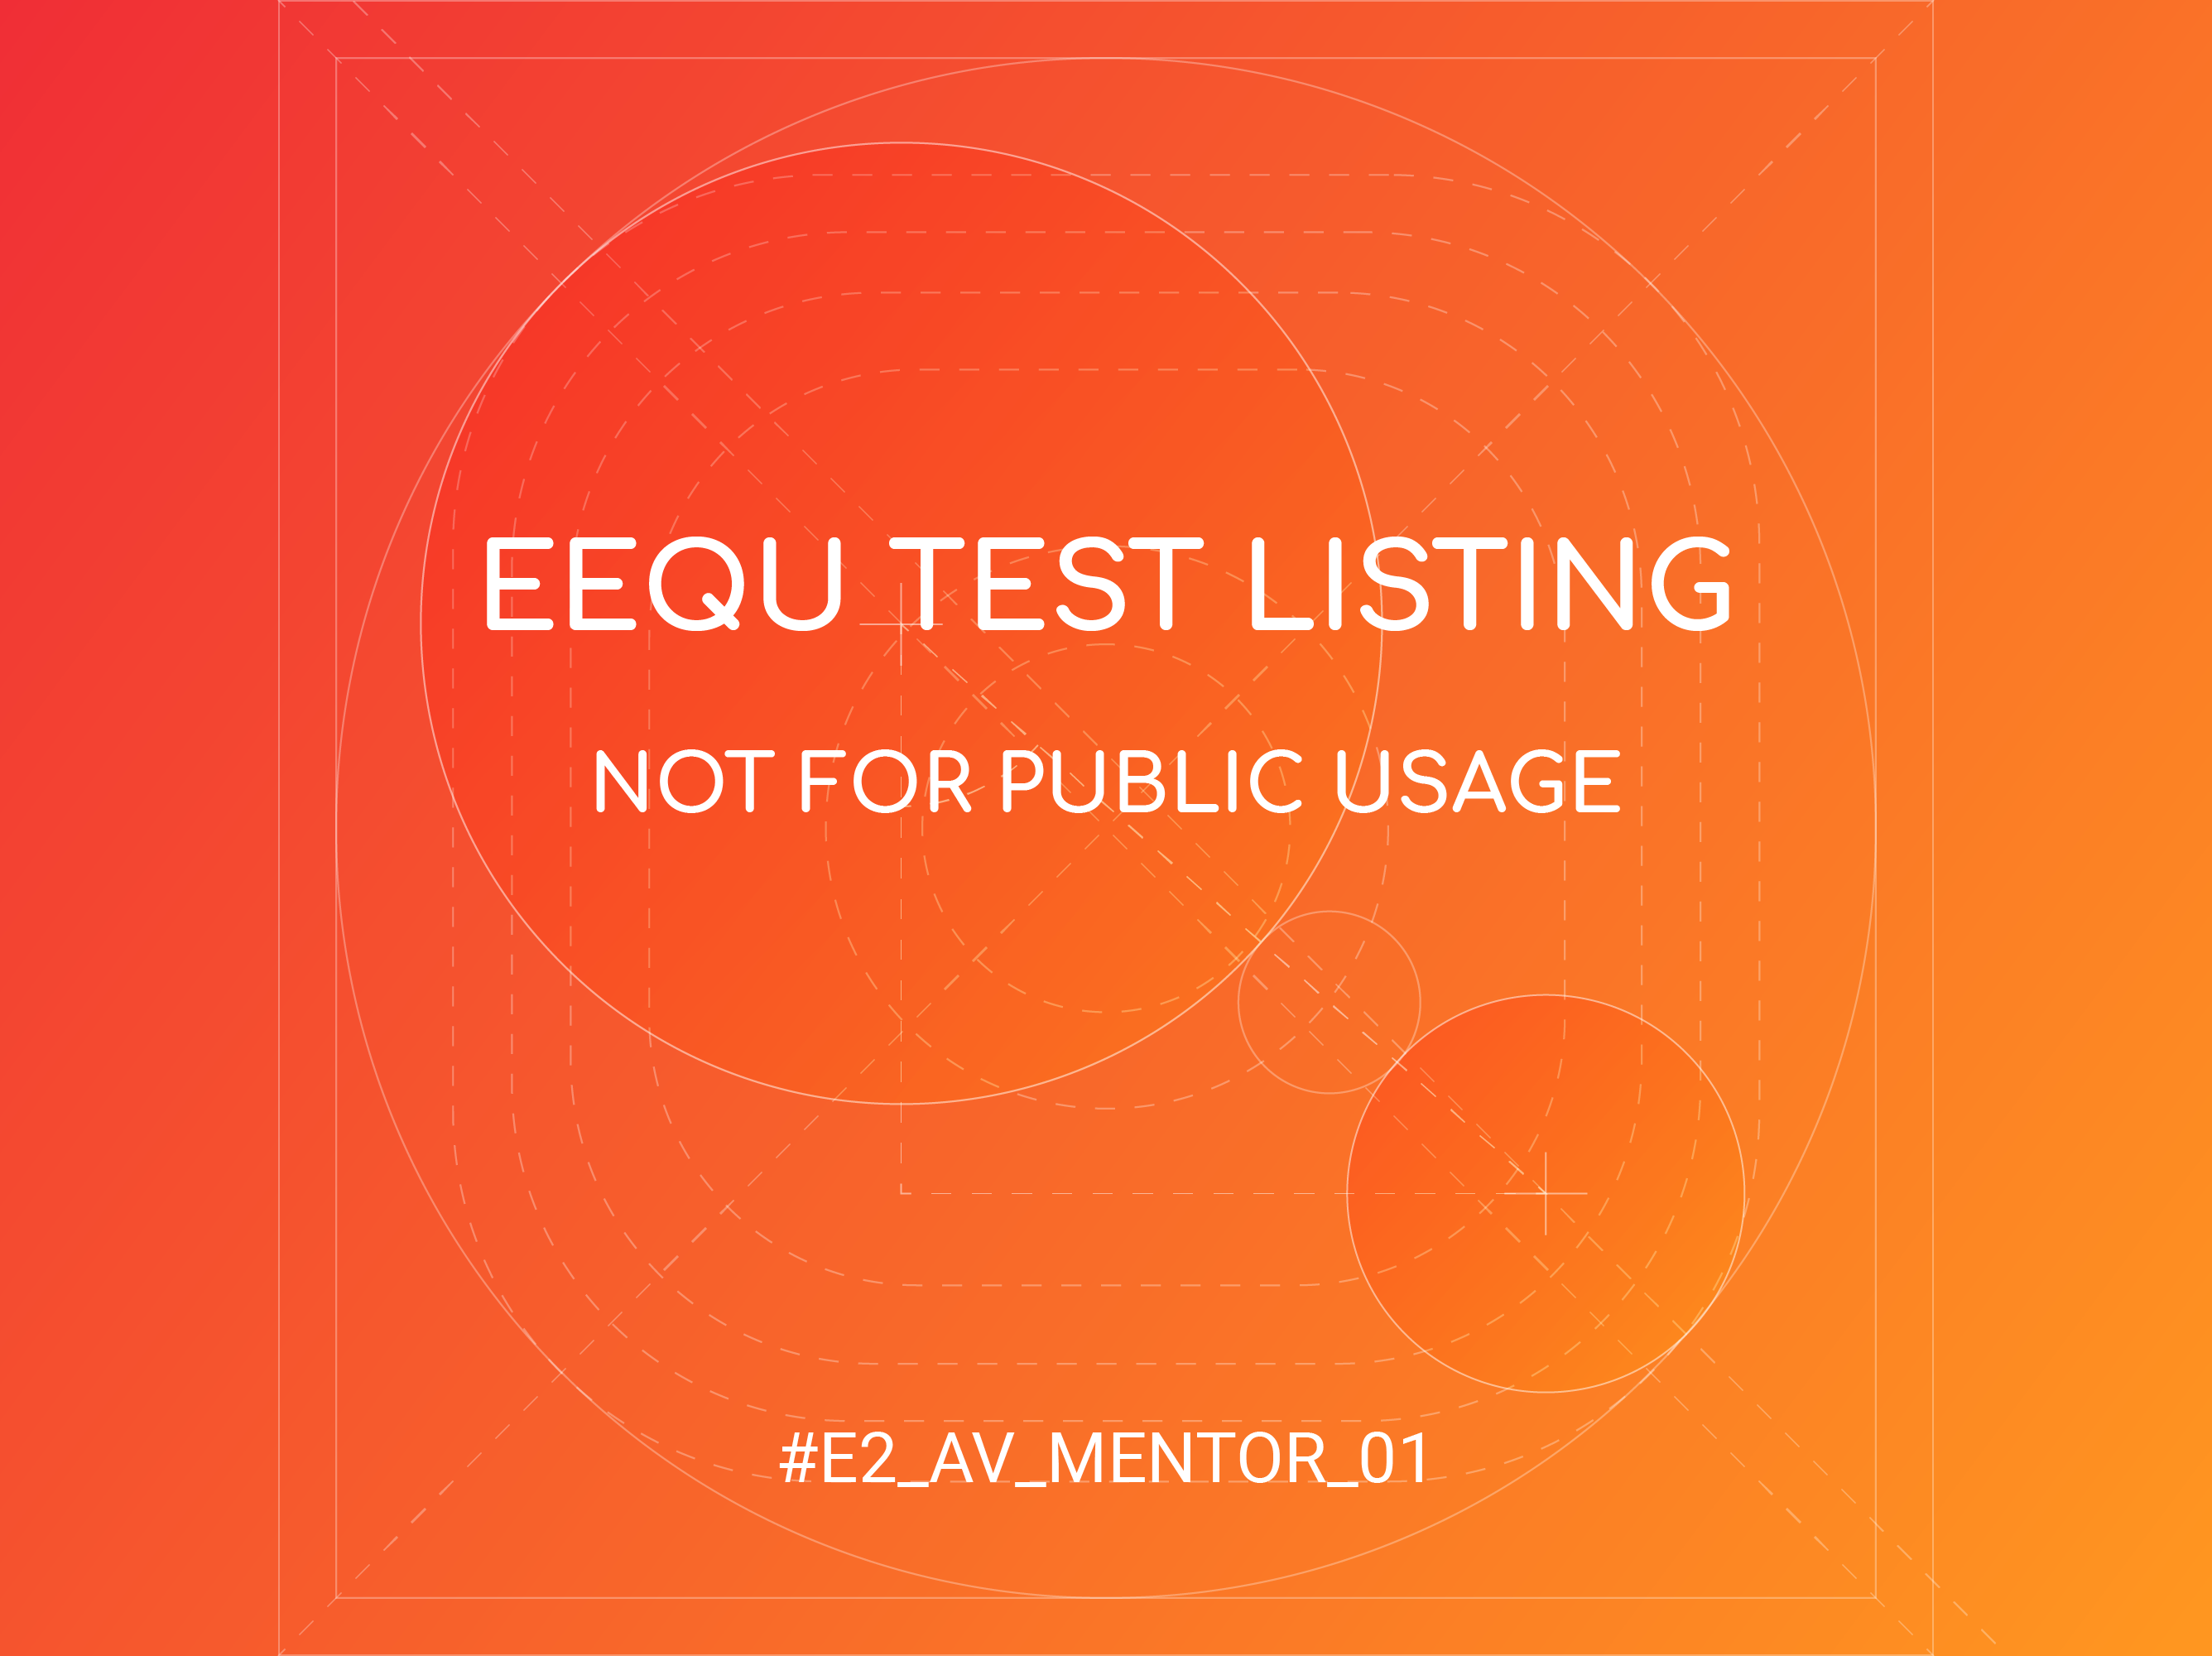 Eequ Test Experience block mentored by Avida Hancock